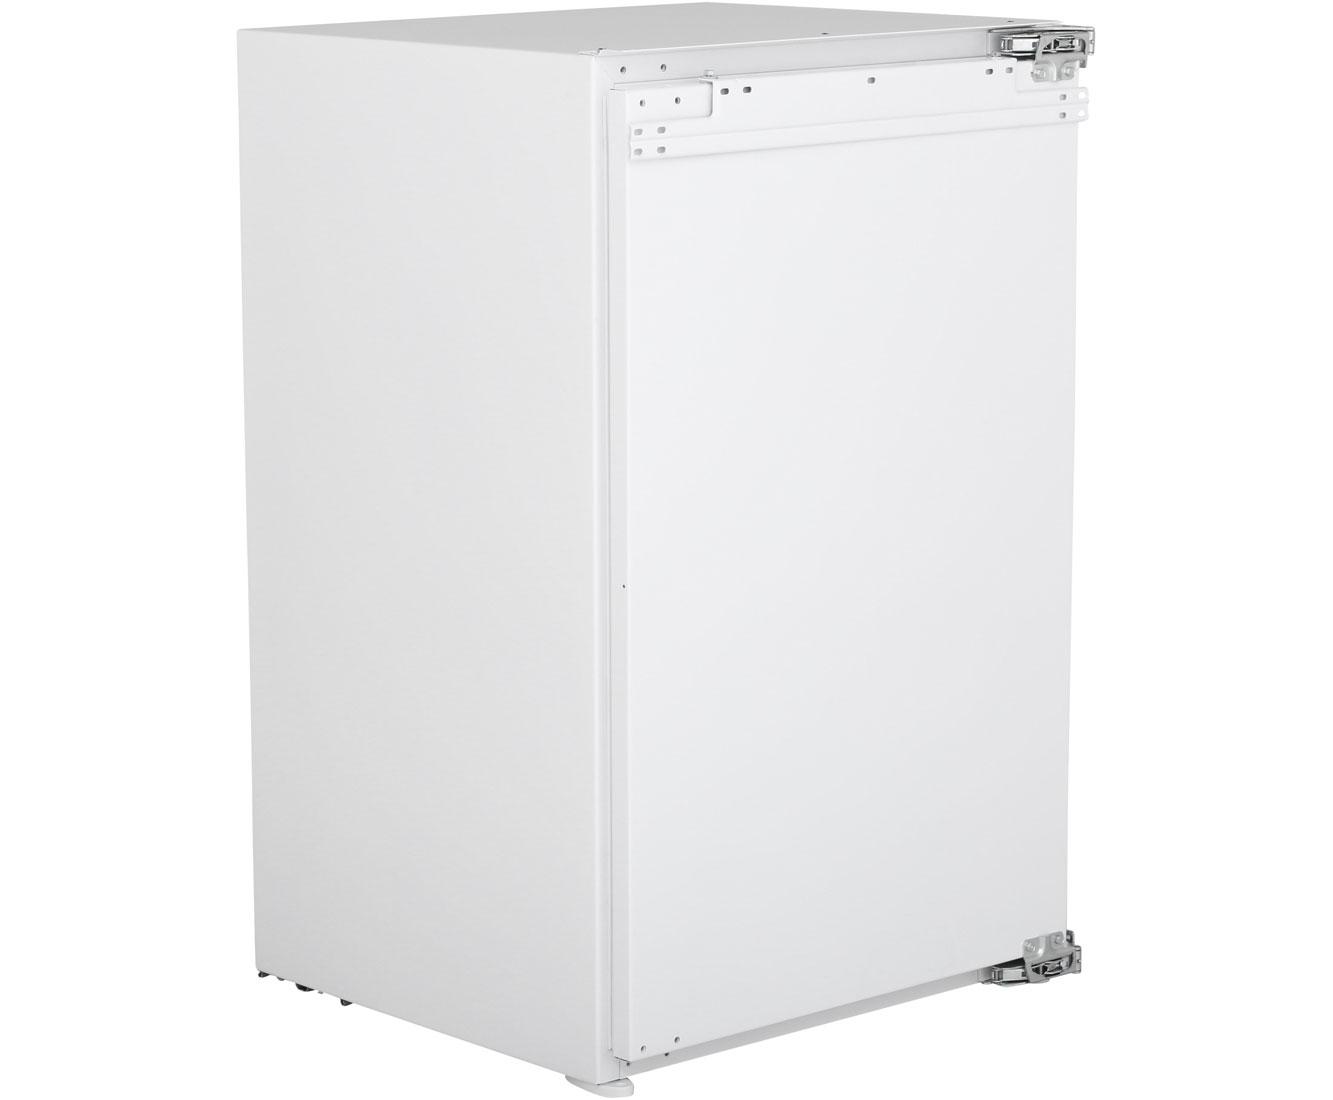 Gorenje Kühlschrank Stufen : Gorenje ri5092aw einbau kühlschrank 88er nische festtür technik a